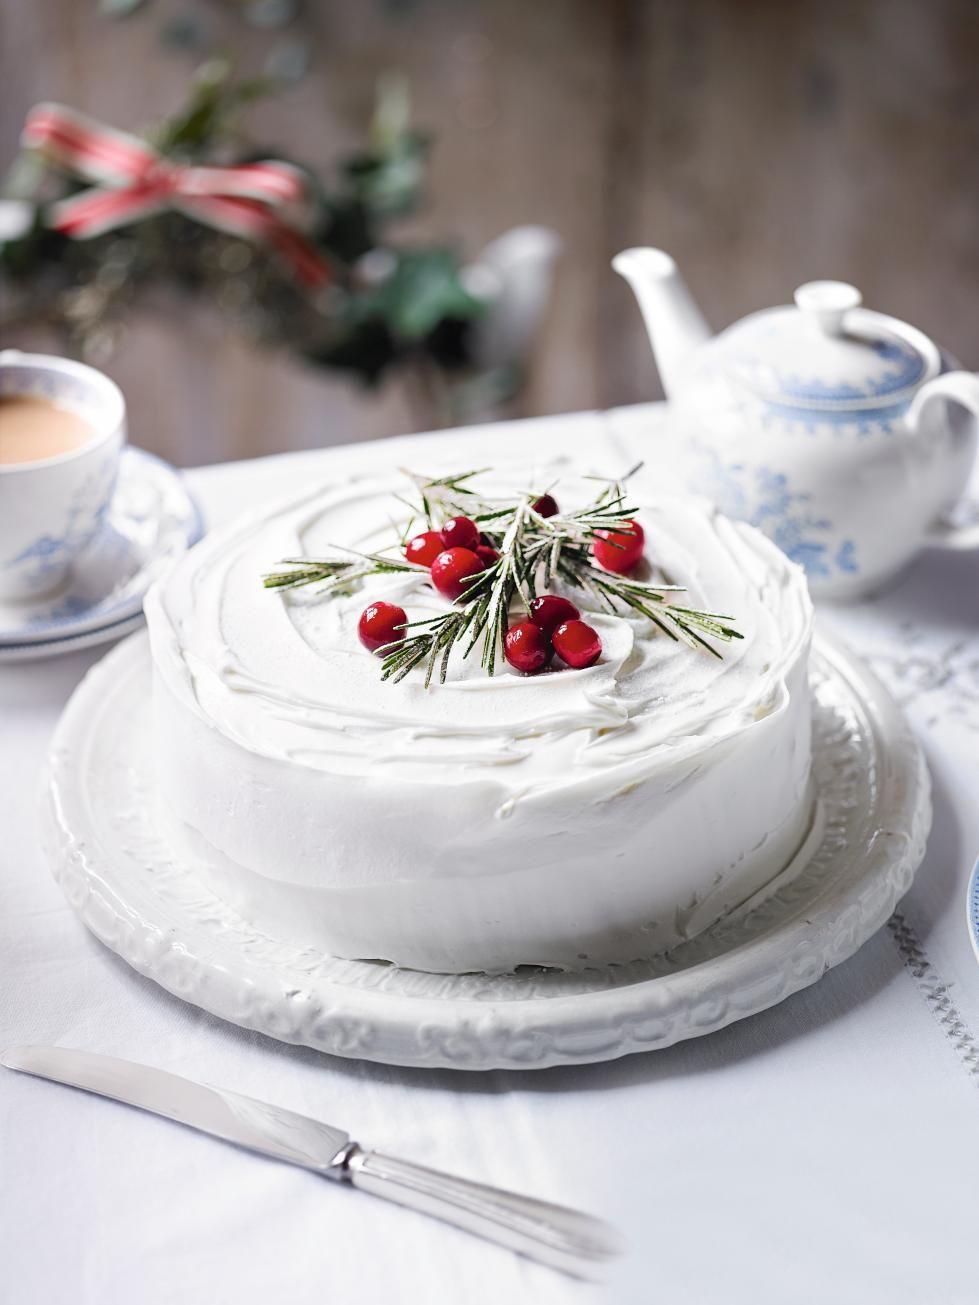 Simple Christmas Cakes  Christmas cake Gâteau de Noël Christmas cake l'autre